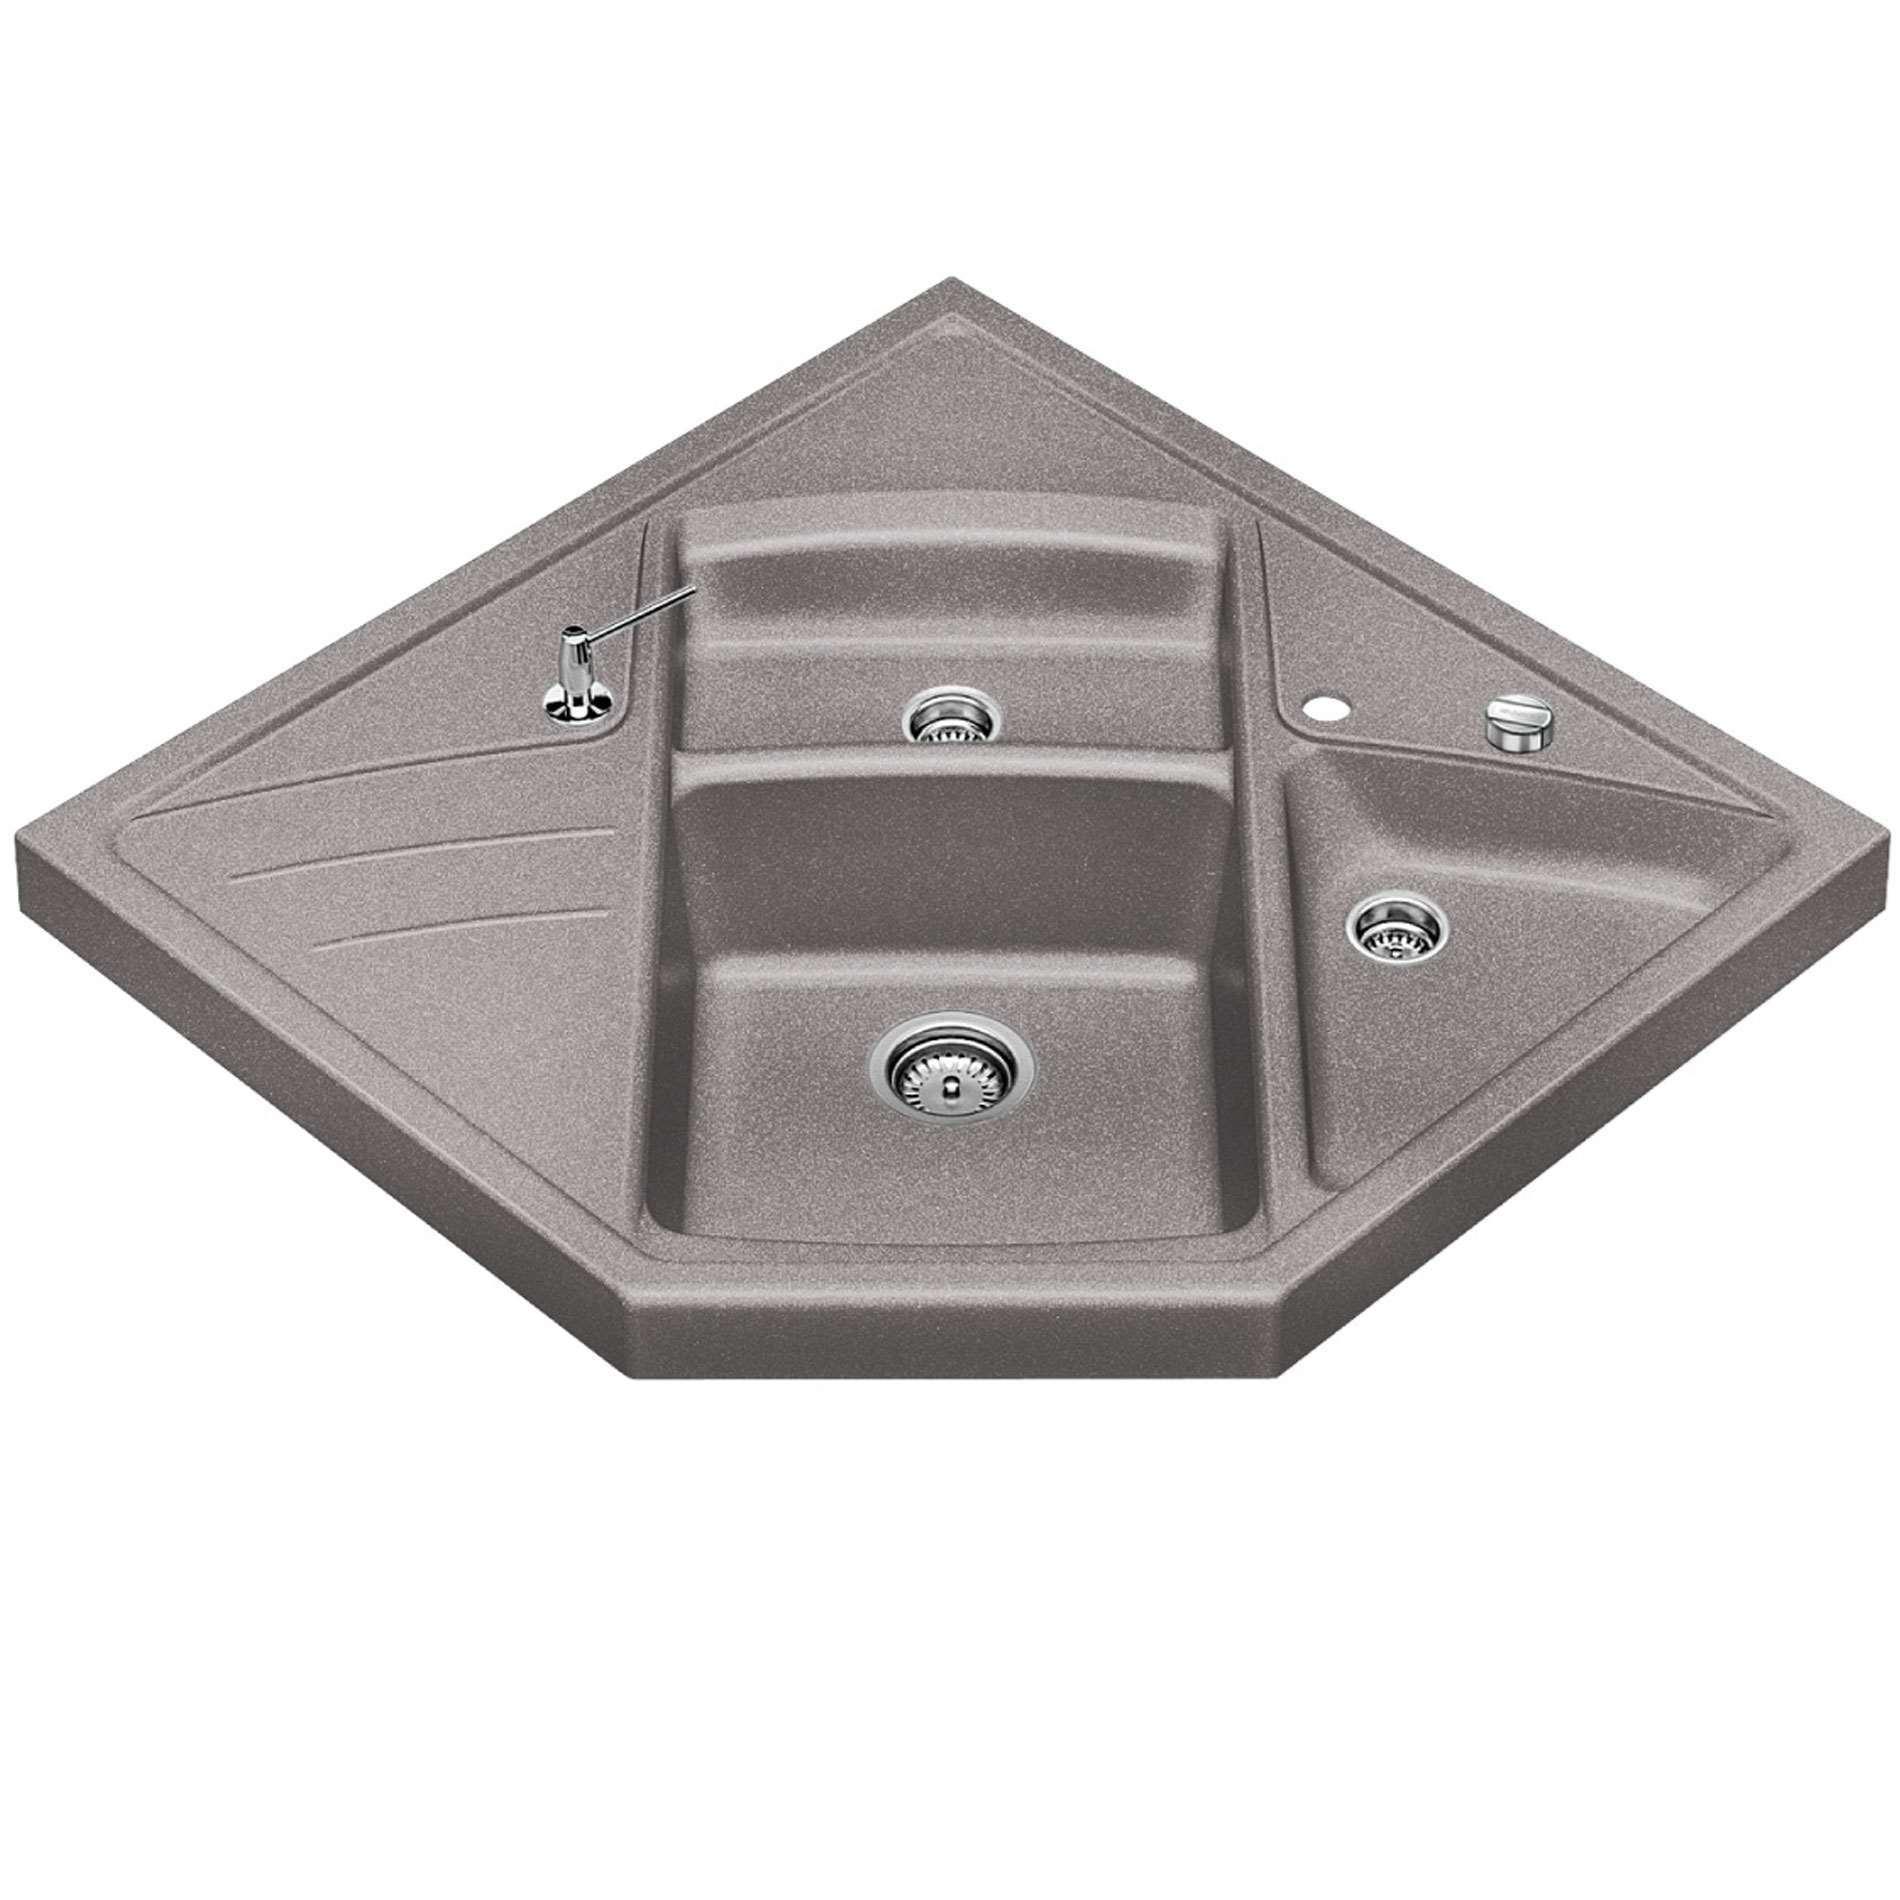 Blanco Silgranit Sink Accessories : Blanco: Modus M-90 Alumetallic Silgranit Sink - Kitchen Sinks & Taps